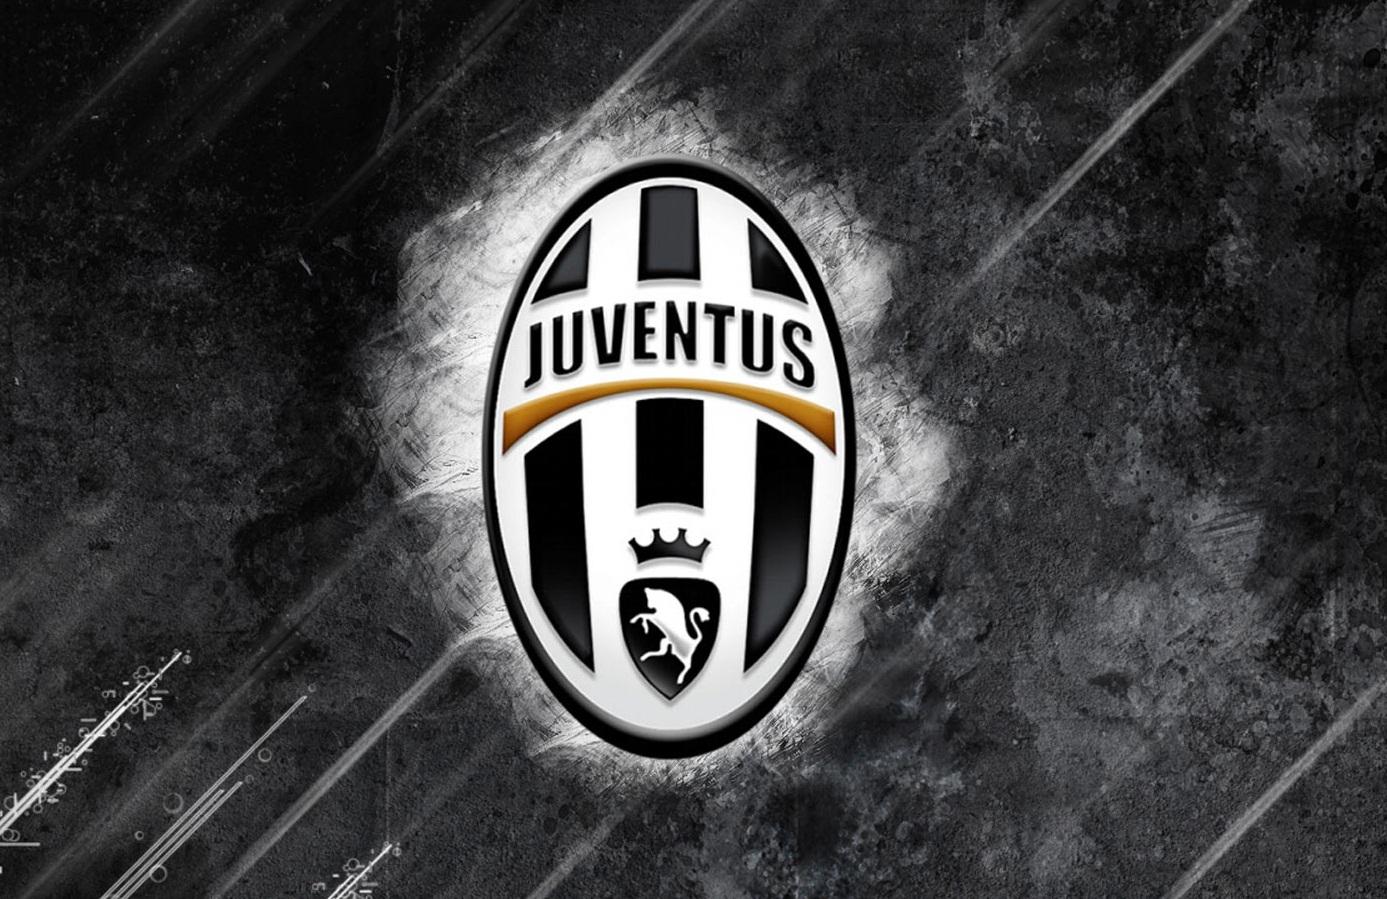 JuventusLogoHDWallpaper 3jpg 1387x899